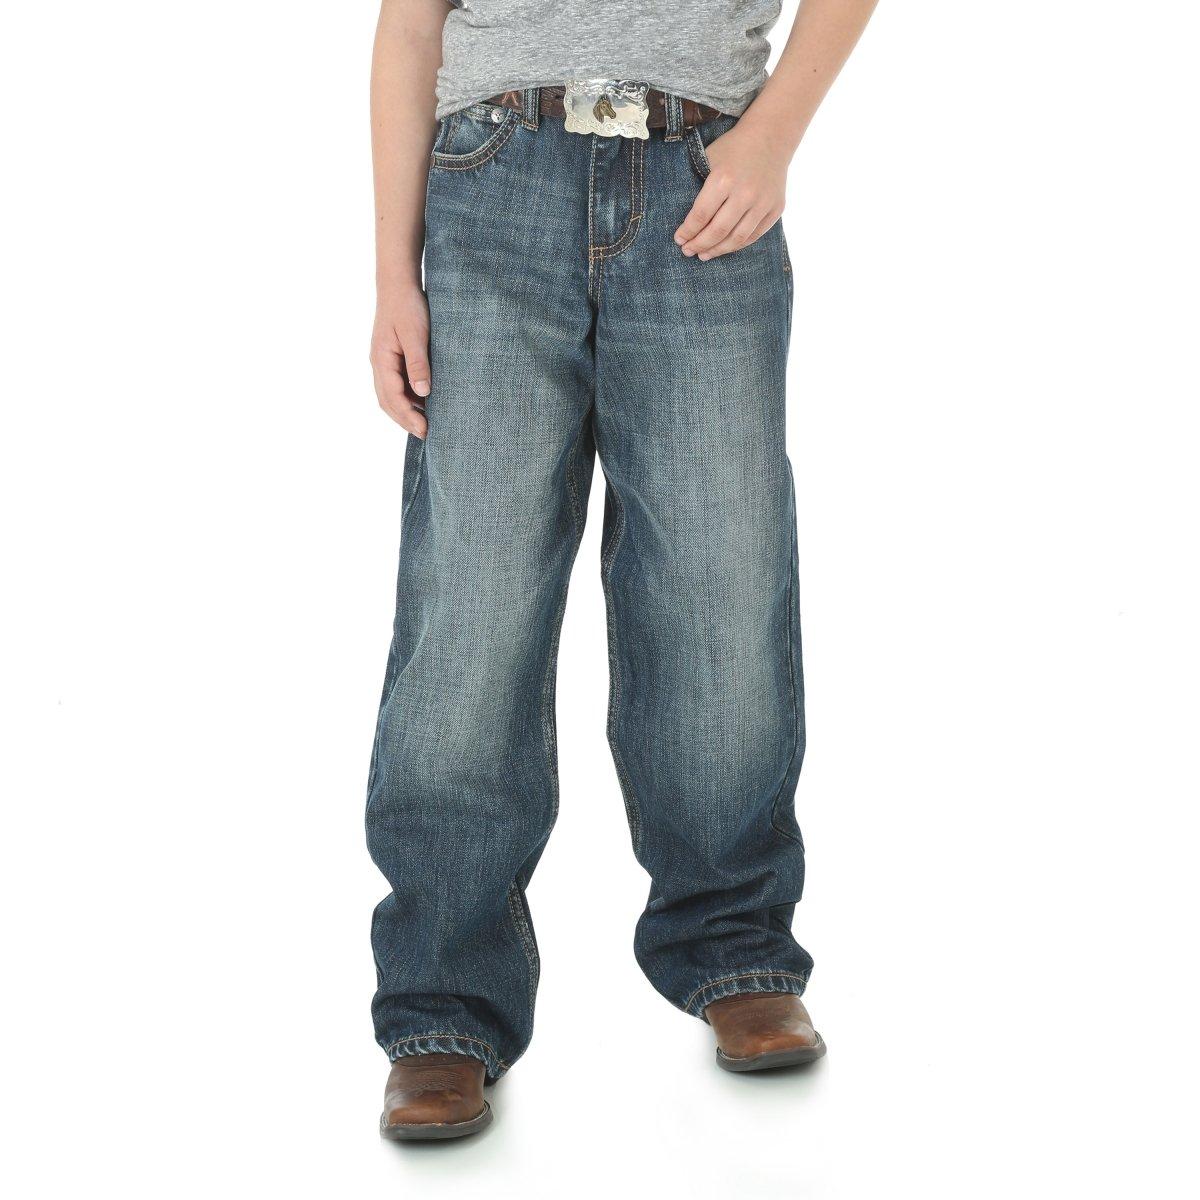 Wrangler Boys' Big 20X Extreme Relaxed Straight Leg Jean, Wells, 12 Husky